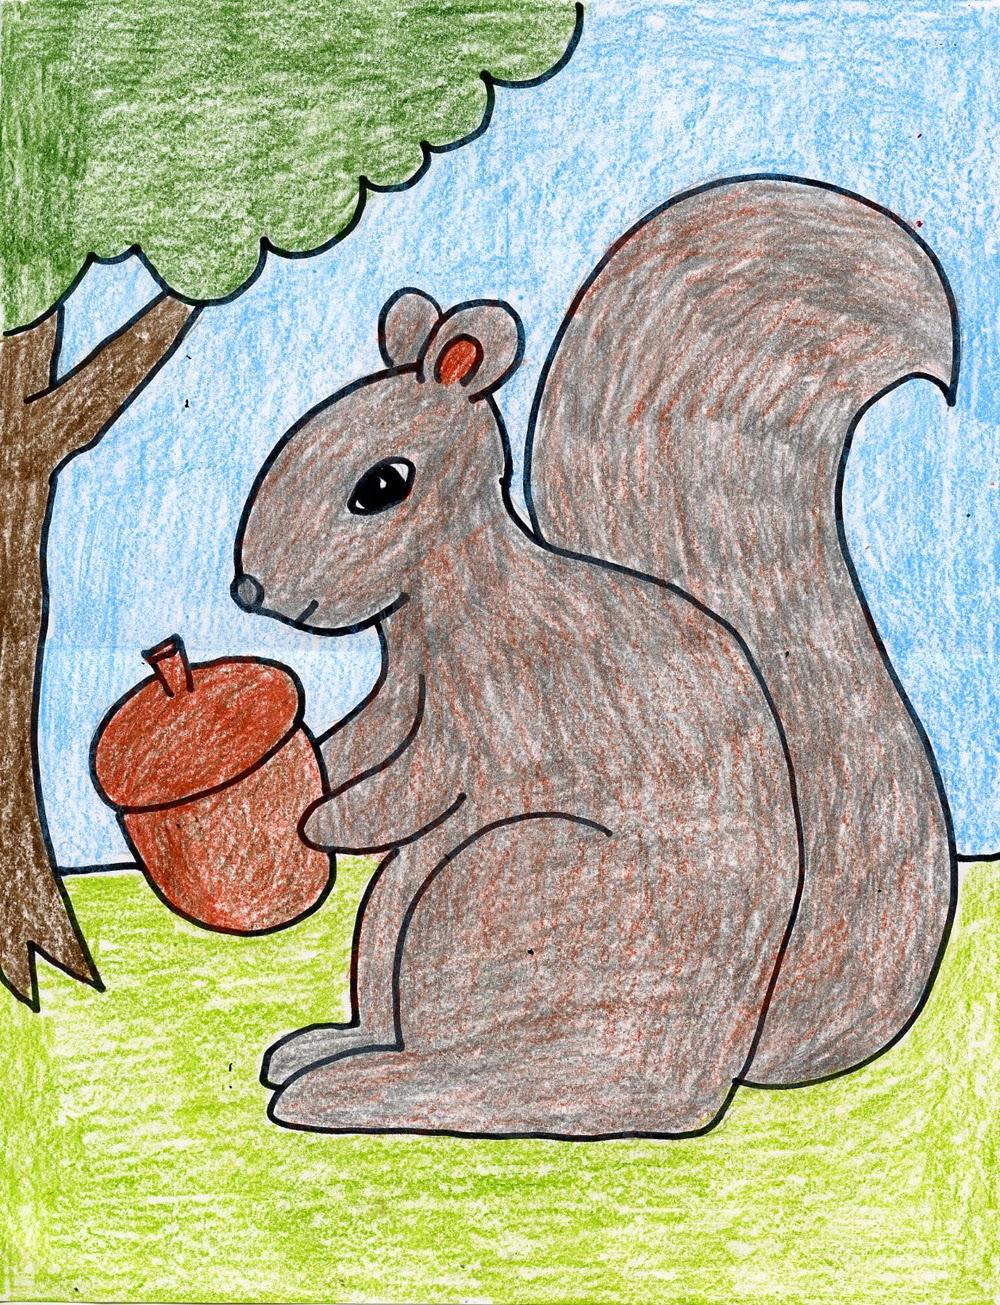 Drawn rodent kindergarten A either too Draw found